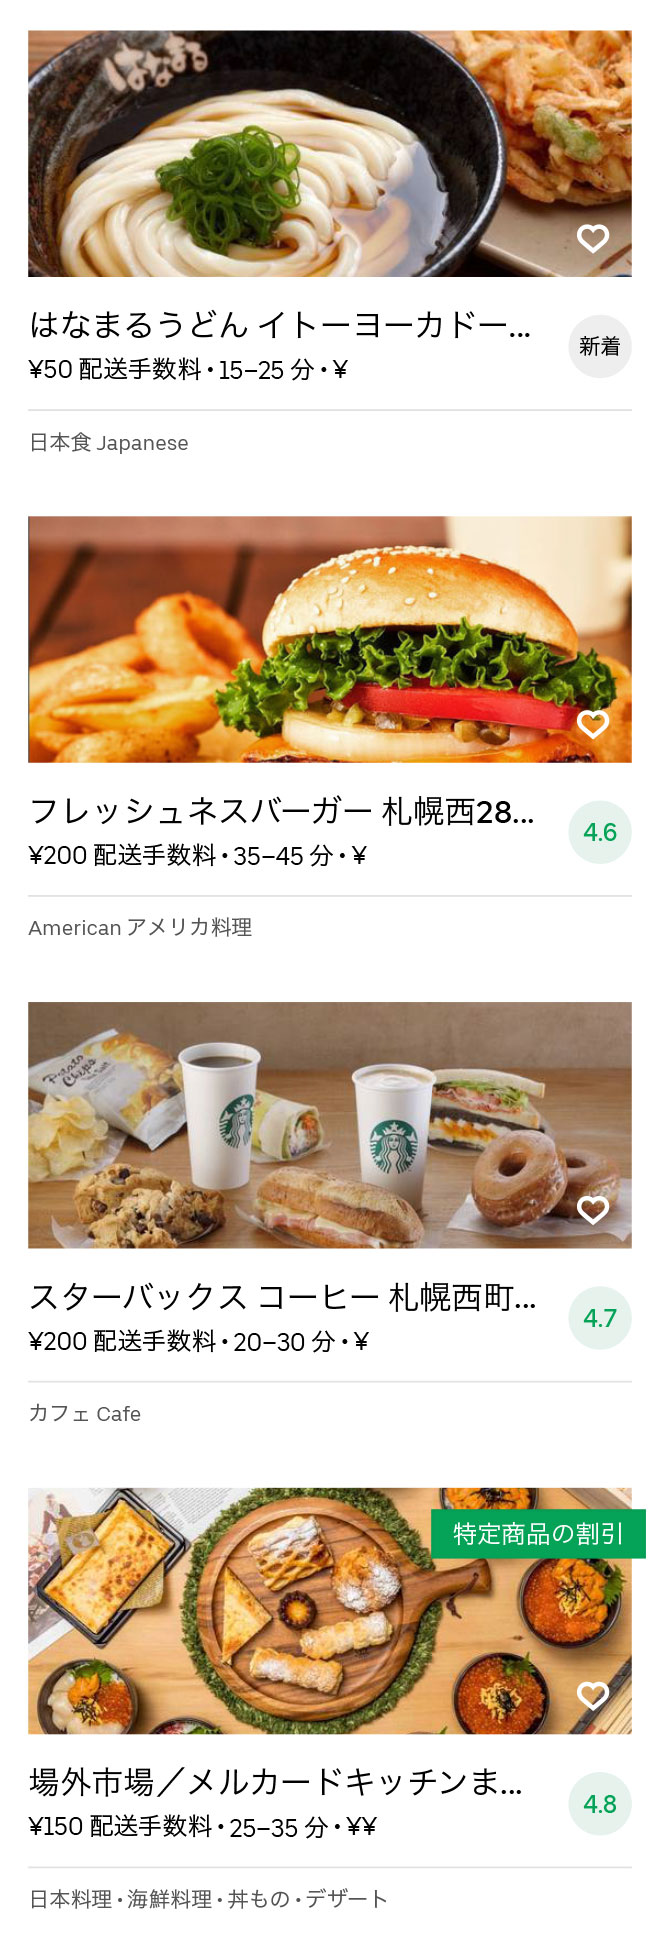 Kotoni jr menu 2008 05